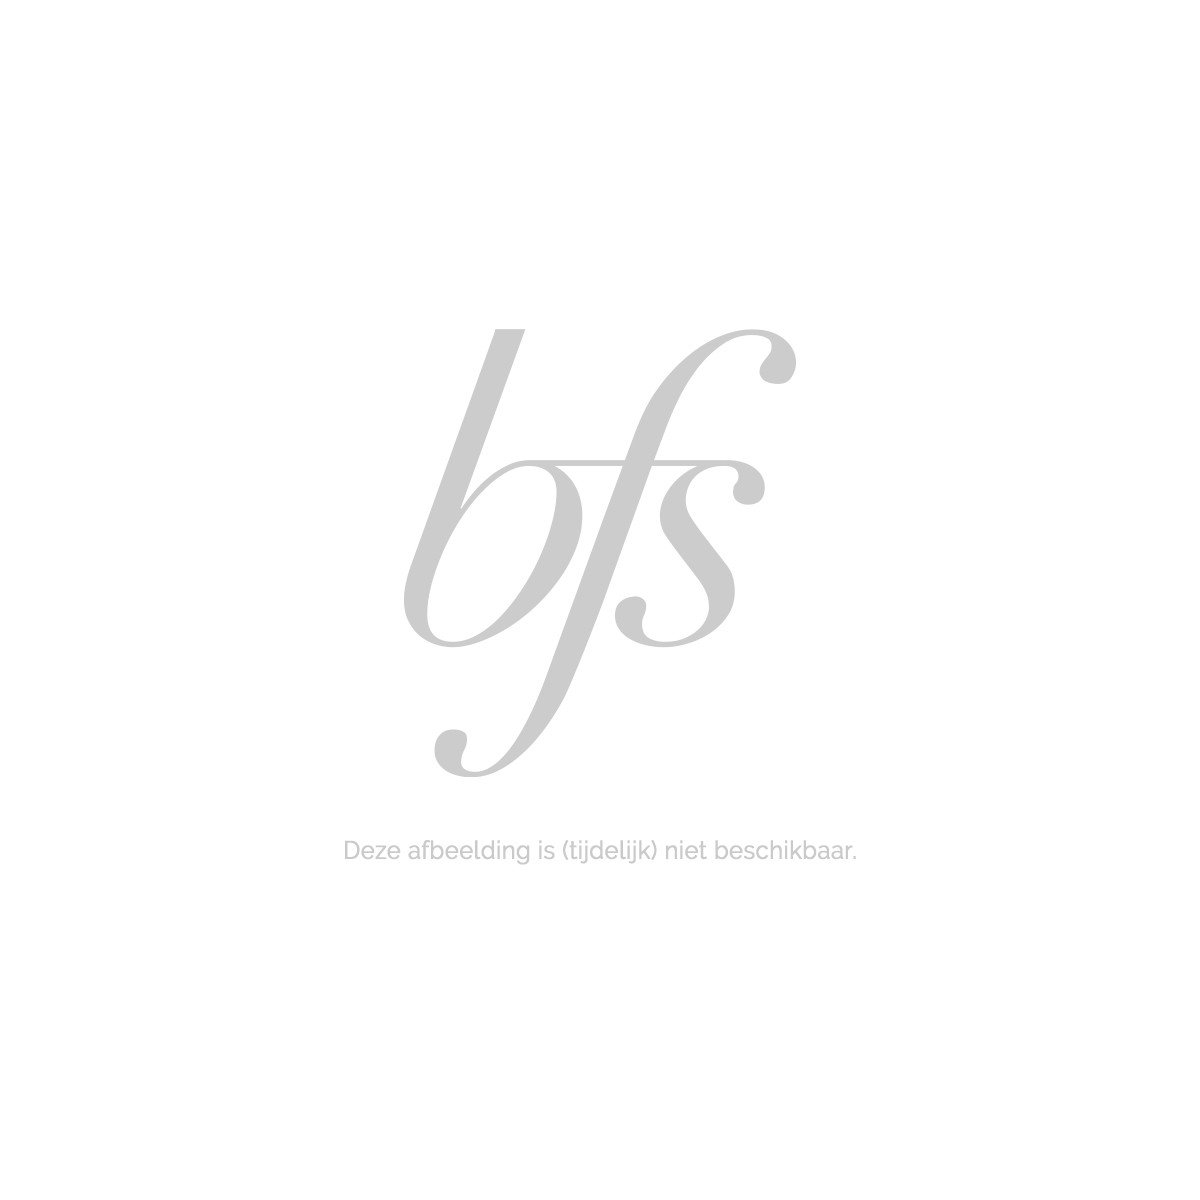 T. LeClerc Eyeliner Pen 02 Brun Moiré